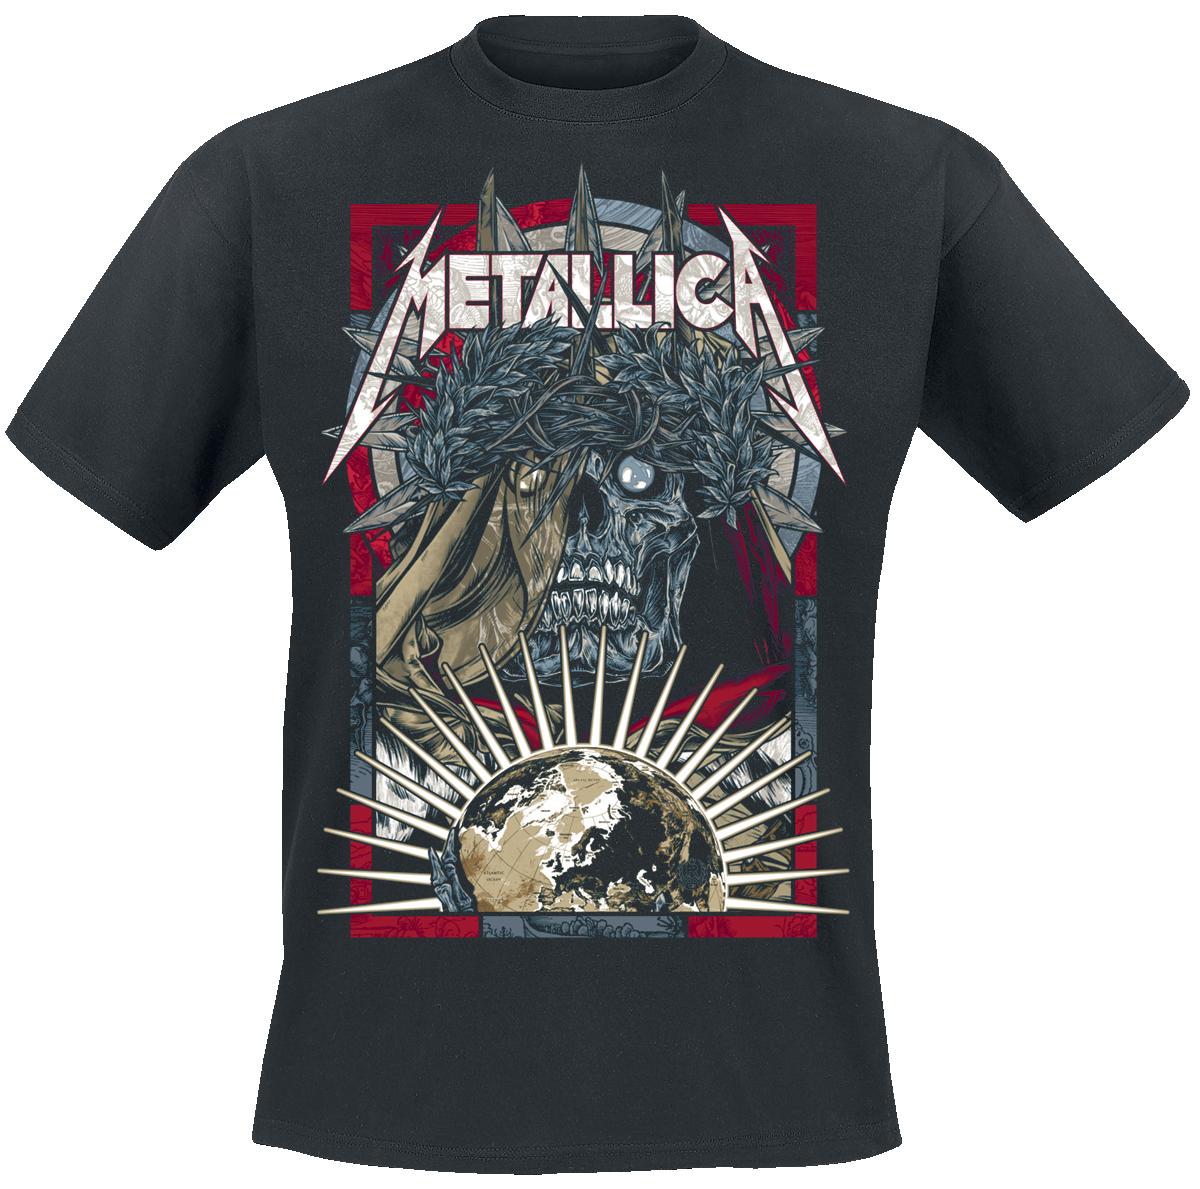 Metallica - Conquest - T-Shirt - black image